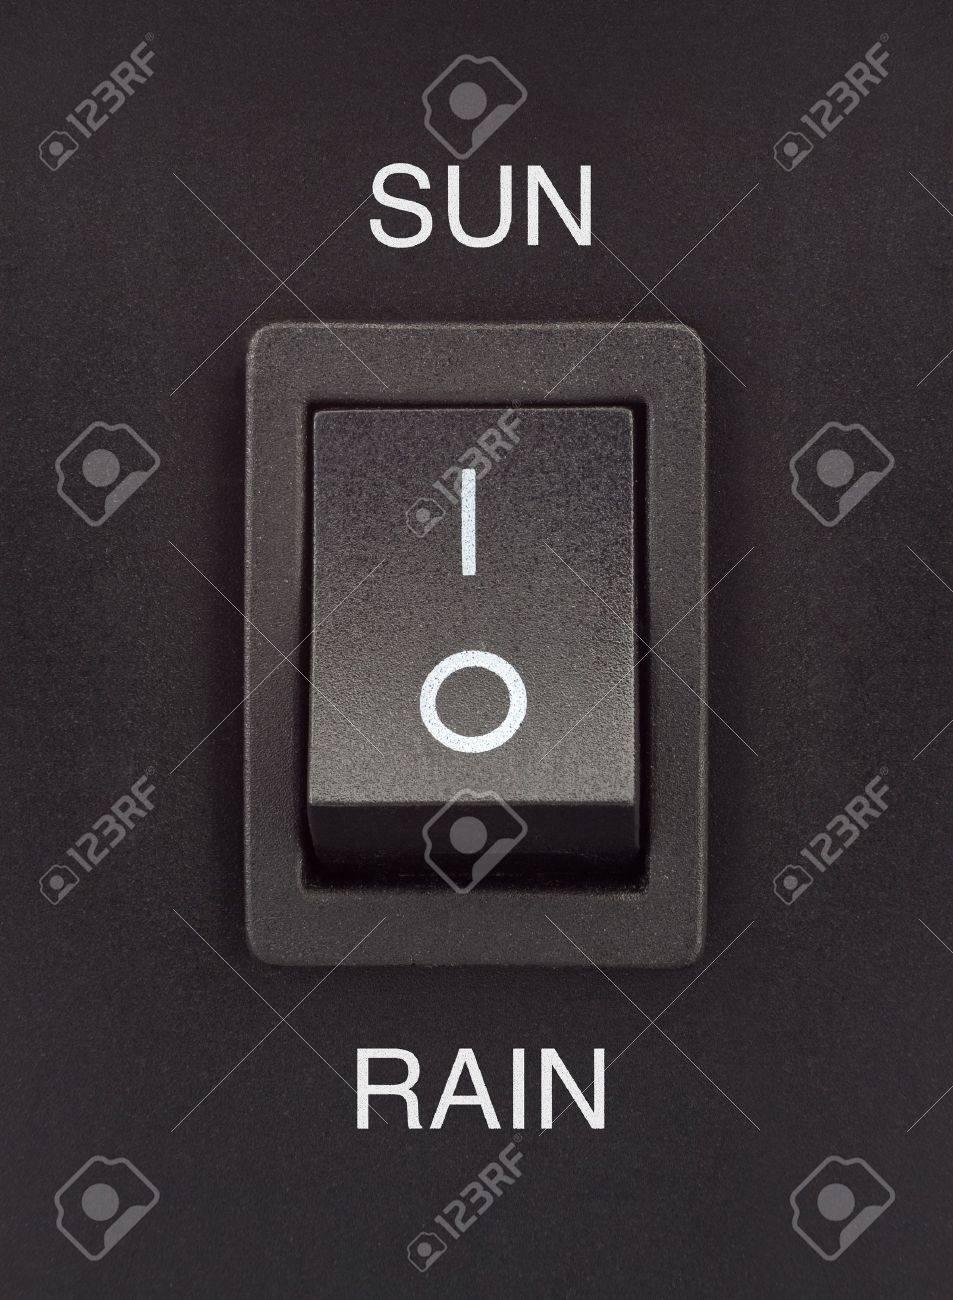 Sun or Rain black toggle switch on black surface positive negative Stock Photo - 16842328